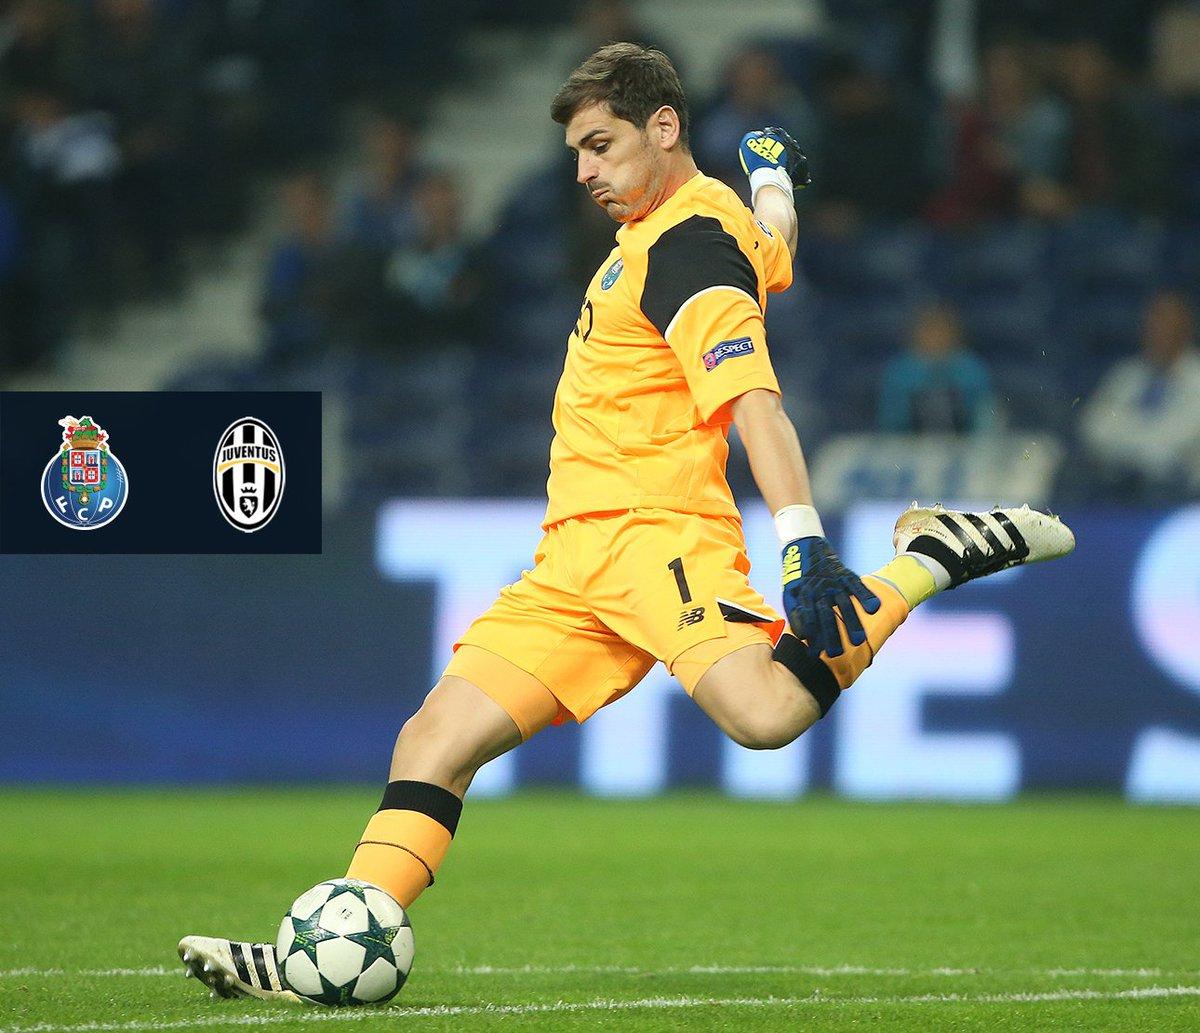 FC Porto-@juventusfc Falta 1 dia 💪 | 1 day left 💪  @IkerCasillas: 162...